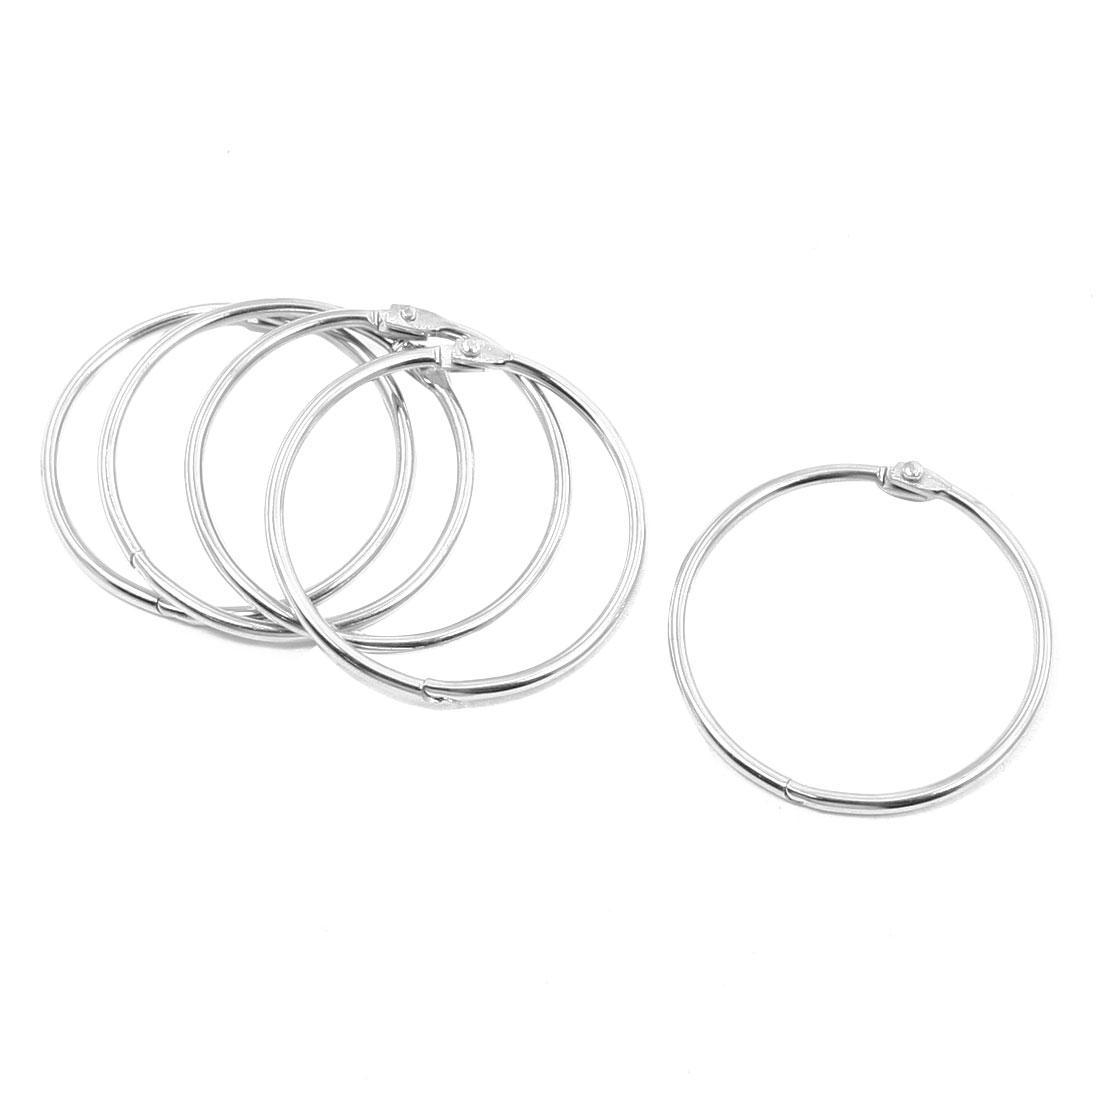 "5 Pcs Portable Silver Tone Metal 2.2"" Diameter Ring Keyring"